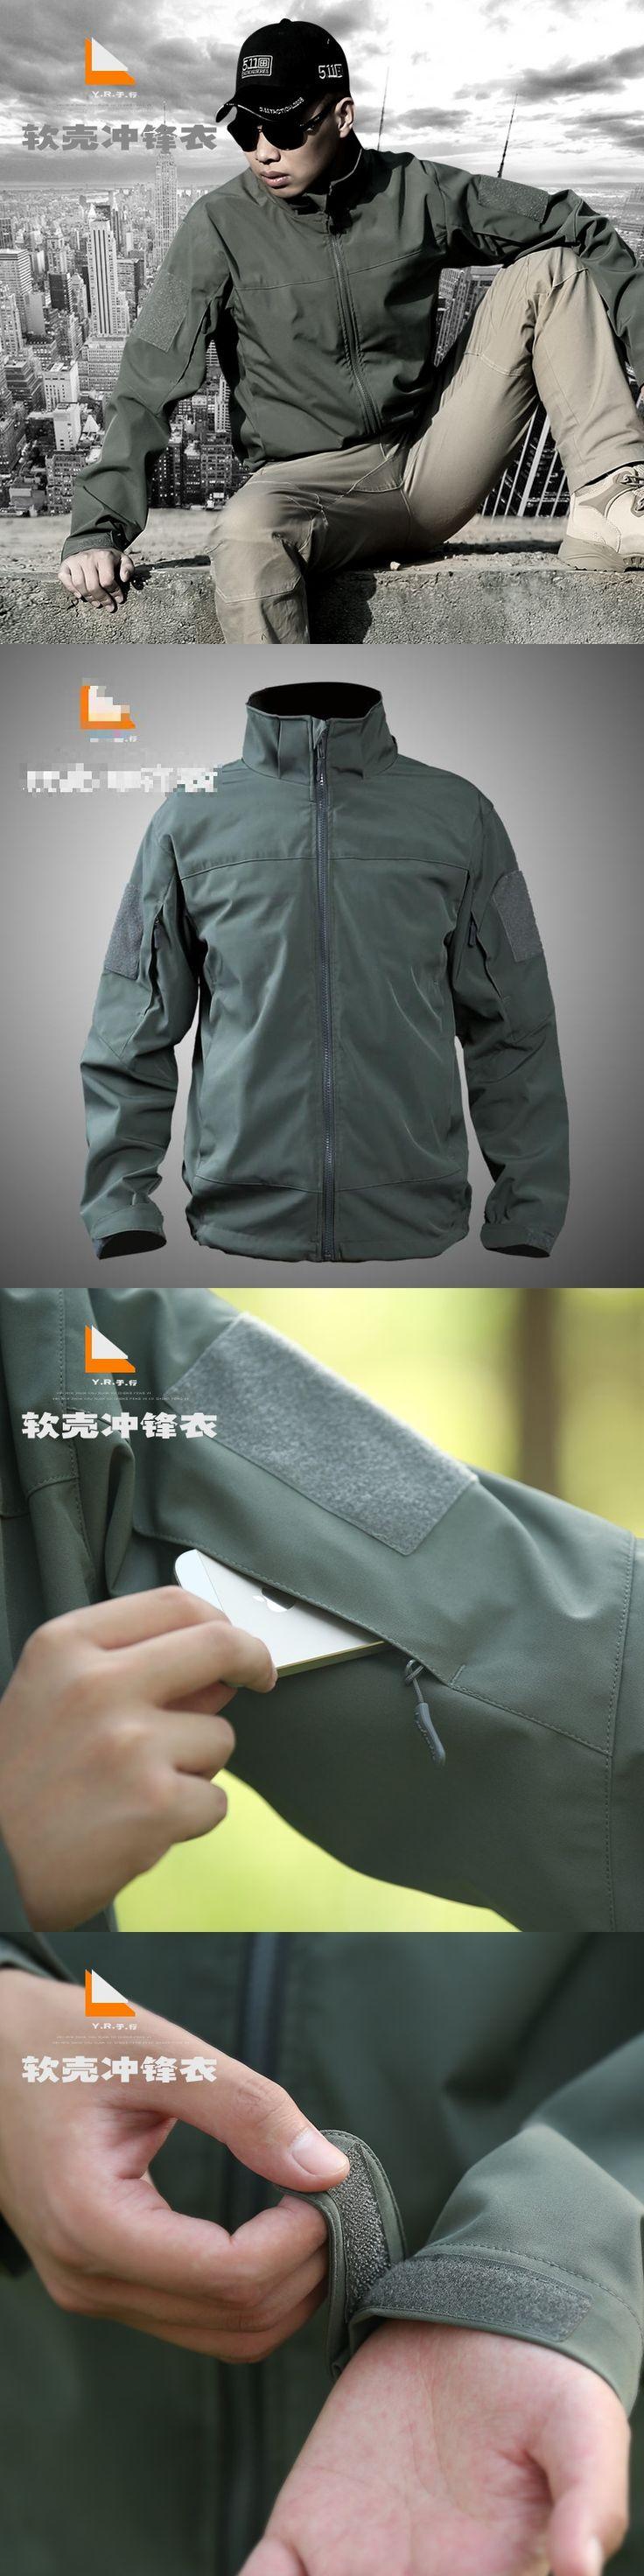 Army Camouflage Coat Military Jacket Man Waterproof Windbreaker Tactical Softshell Hoodie Jacket Army Clothing